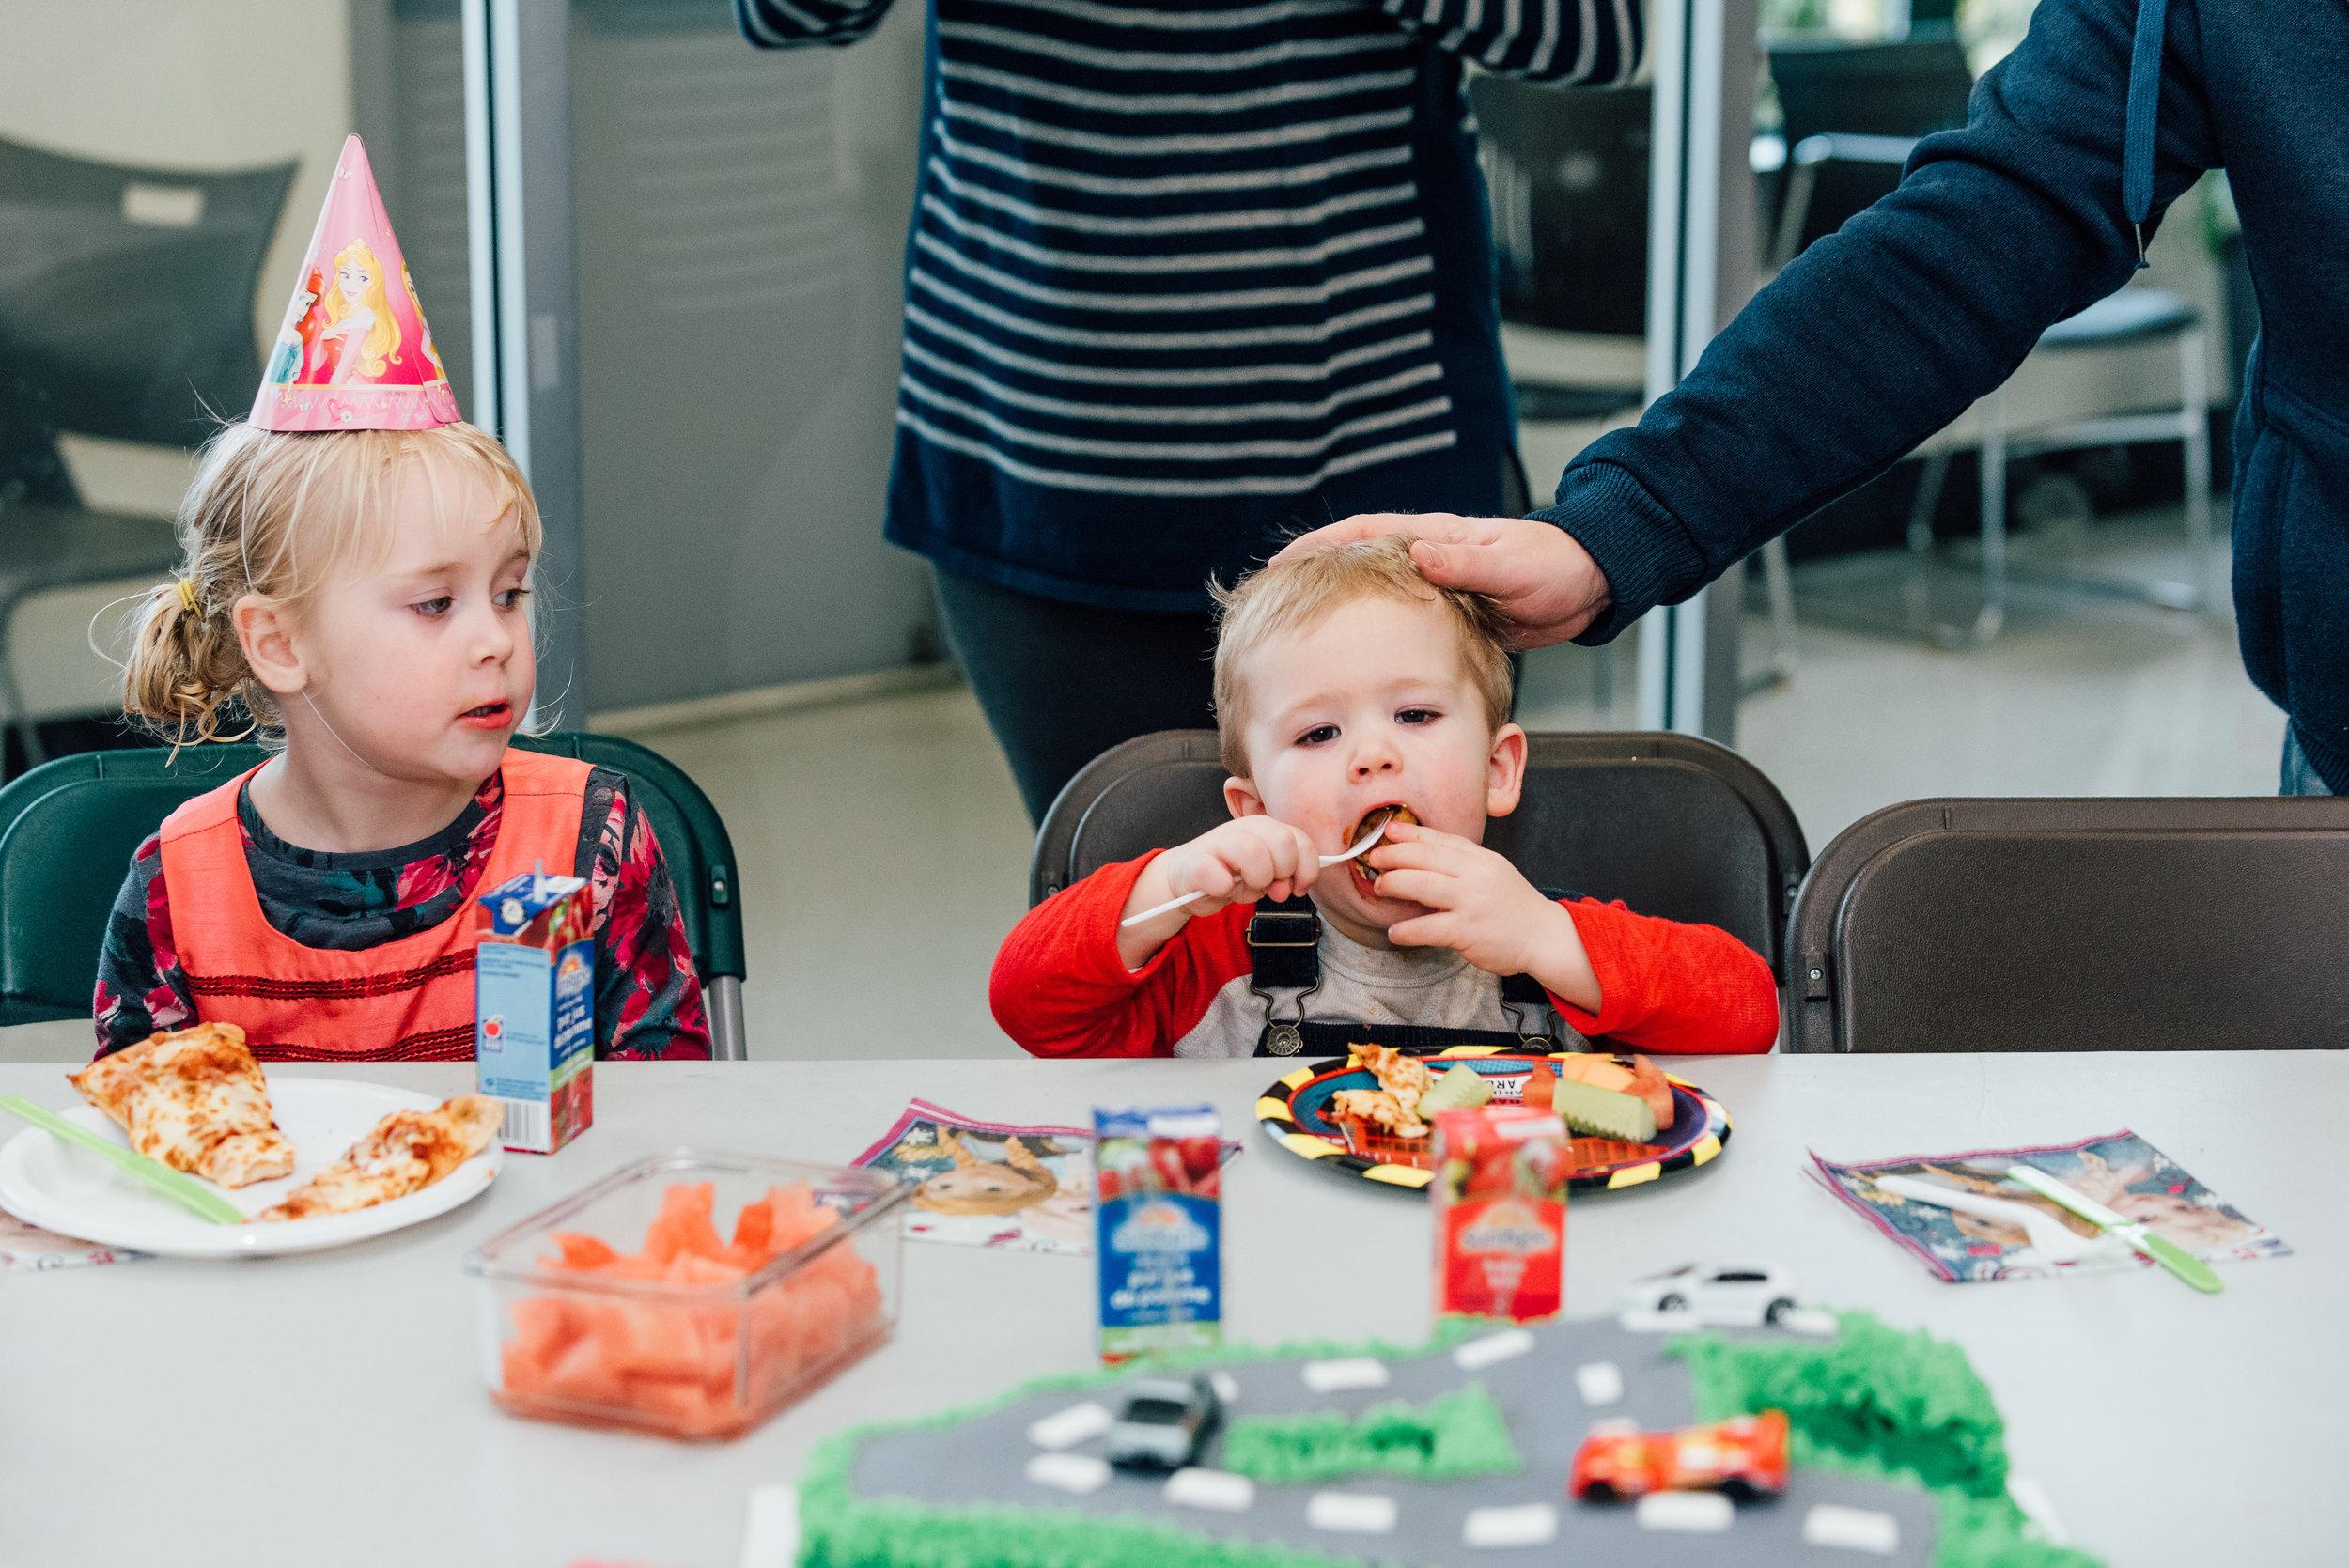 Nicola_Reiersen_Photography_Kids_Birthday_Pool_Party (28).jpg